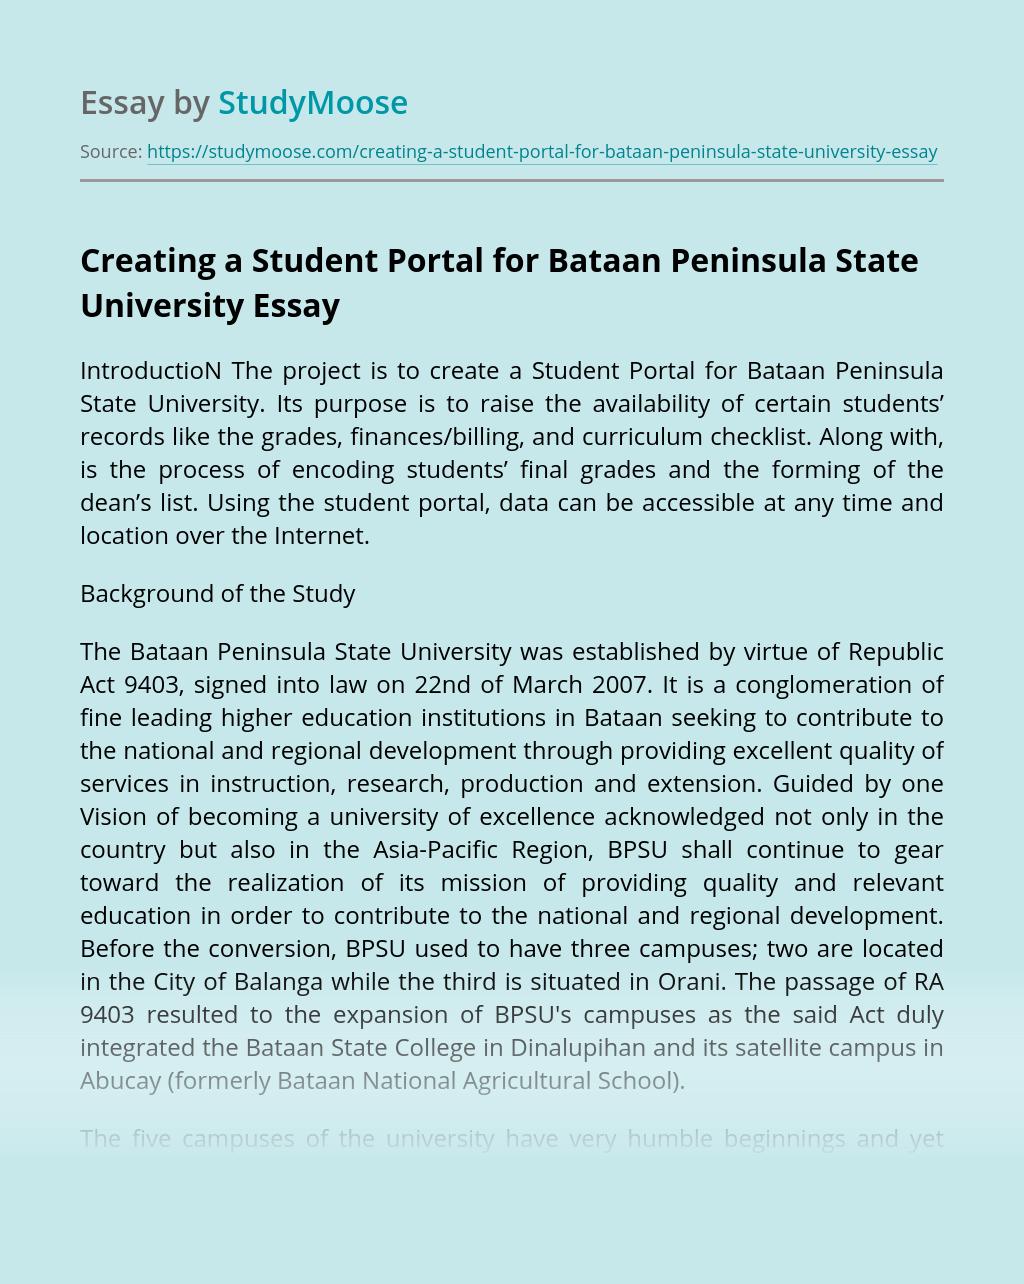 Creating a Student Portal for Bataan Peninsula State University